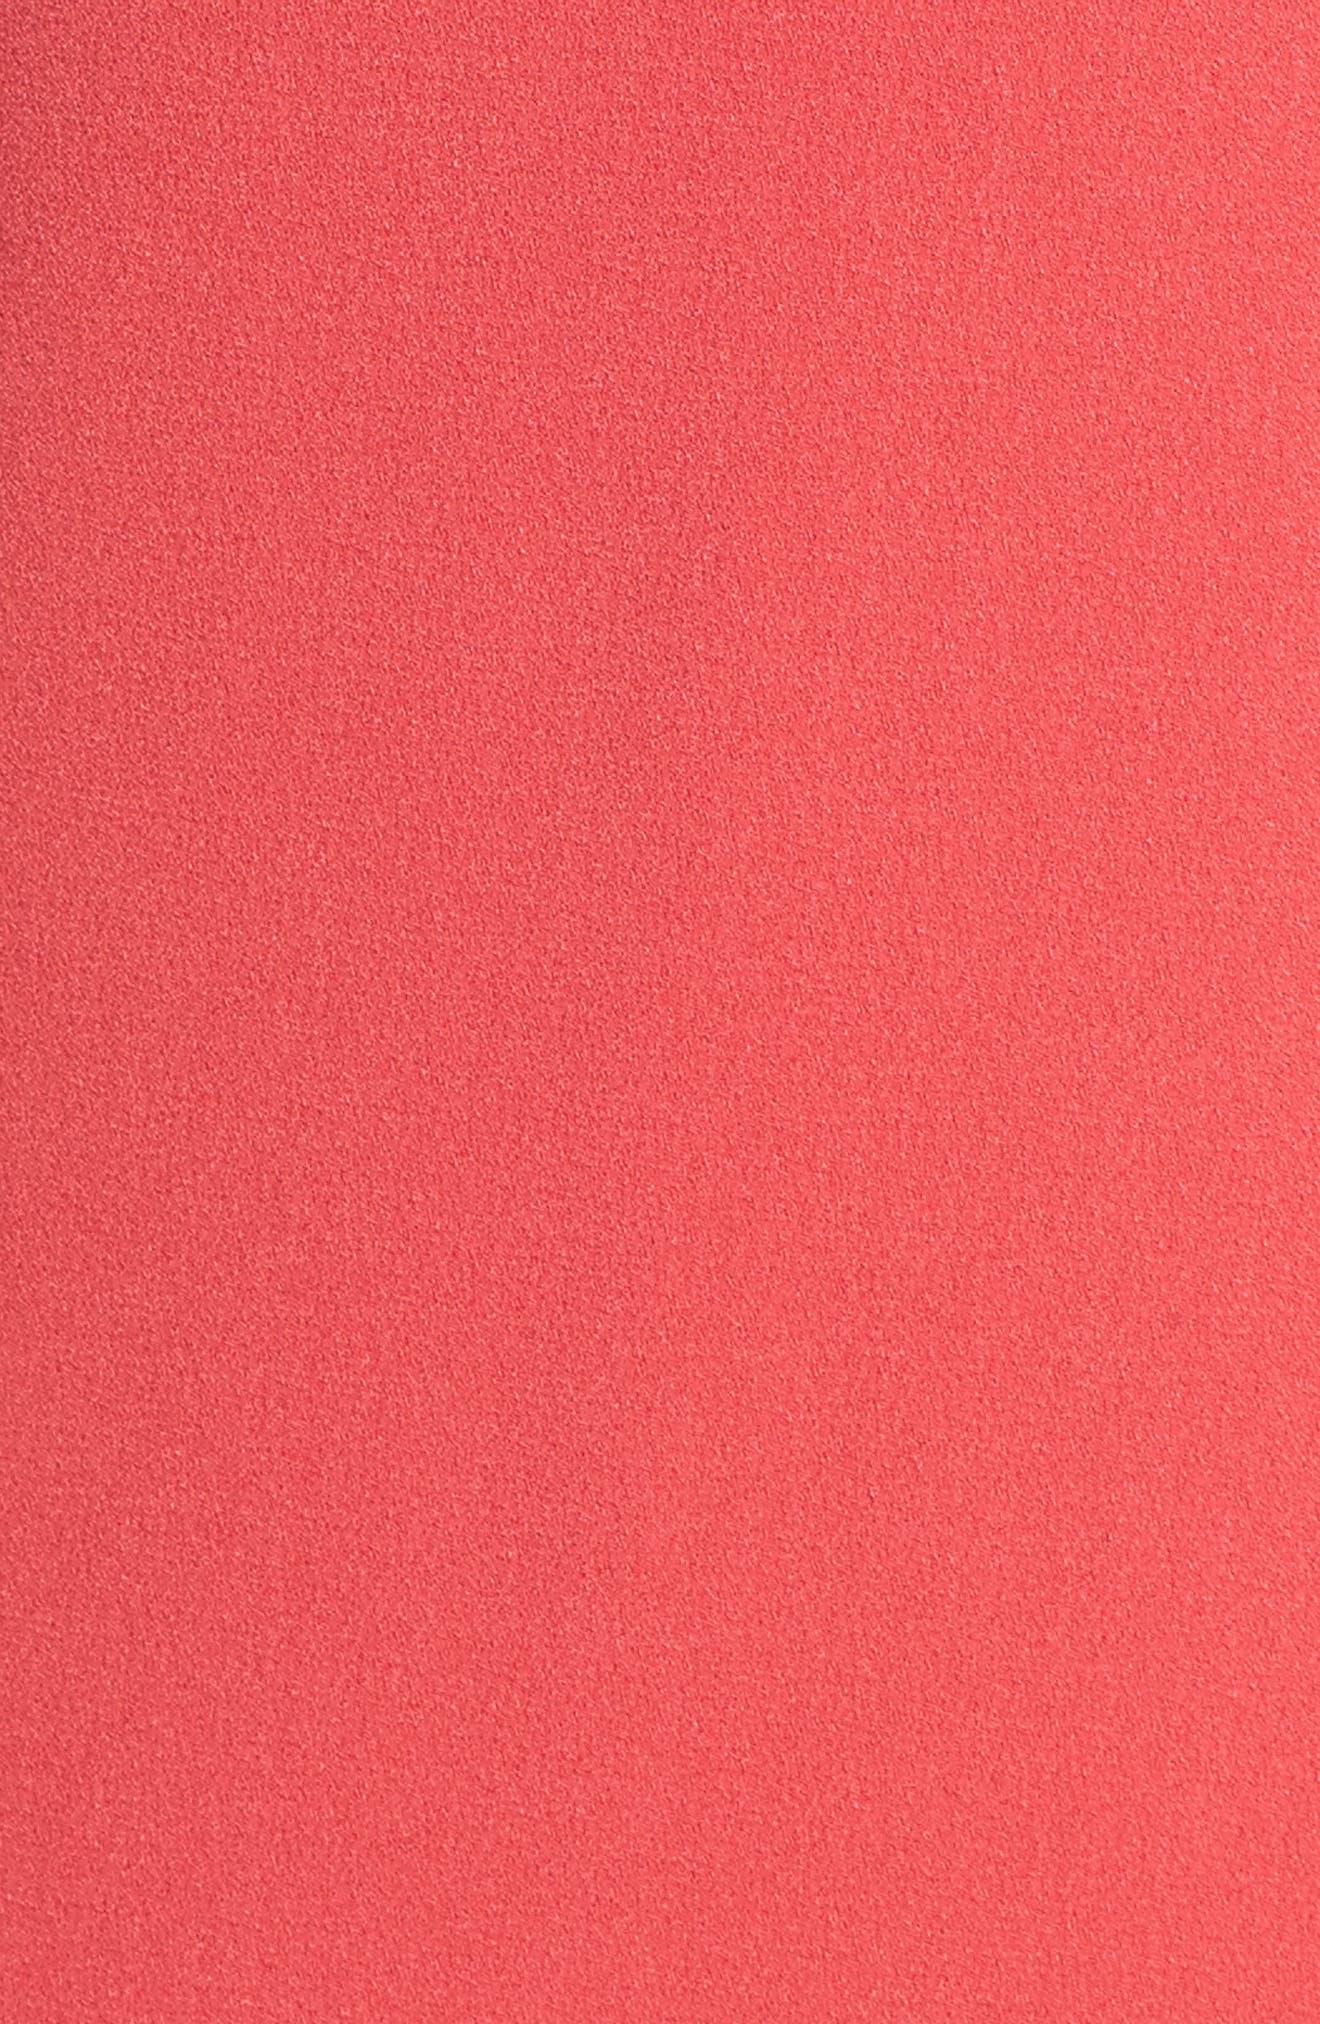 Tie Neck Flounce Hem Dress,                             Alternate thumbnail 5, color,